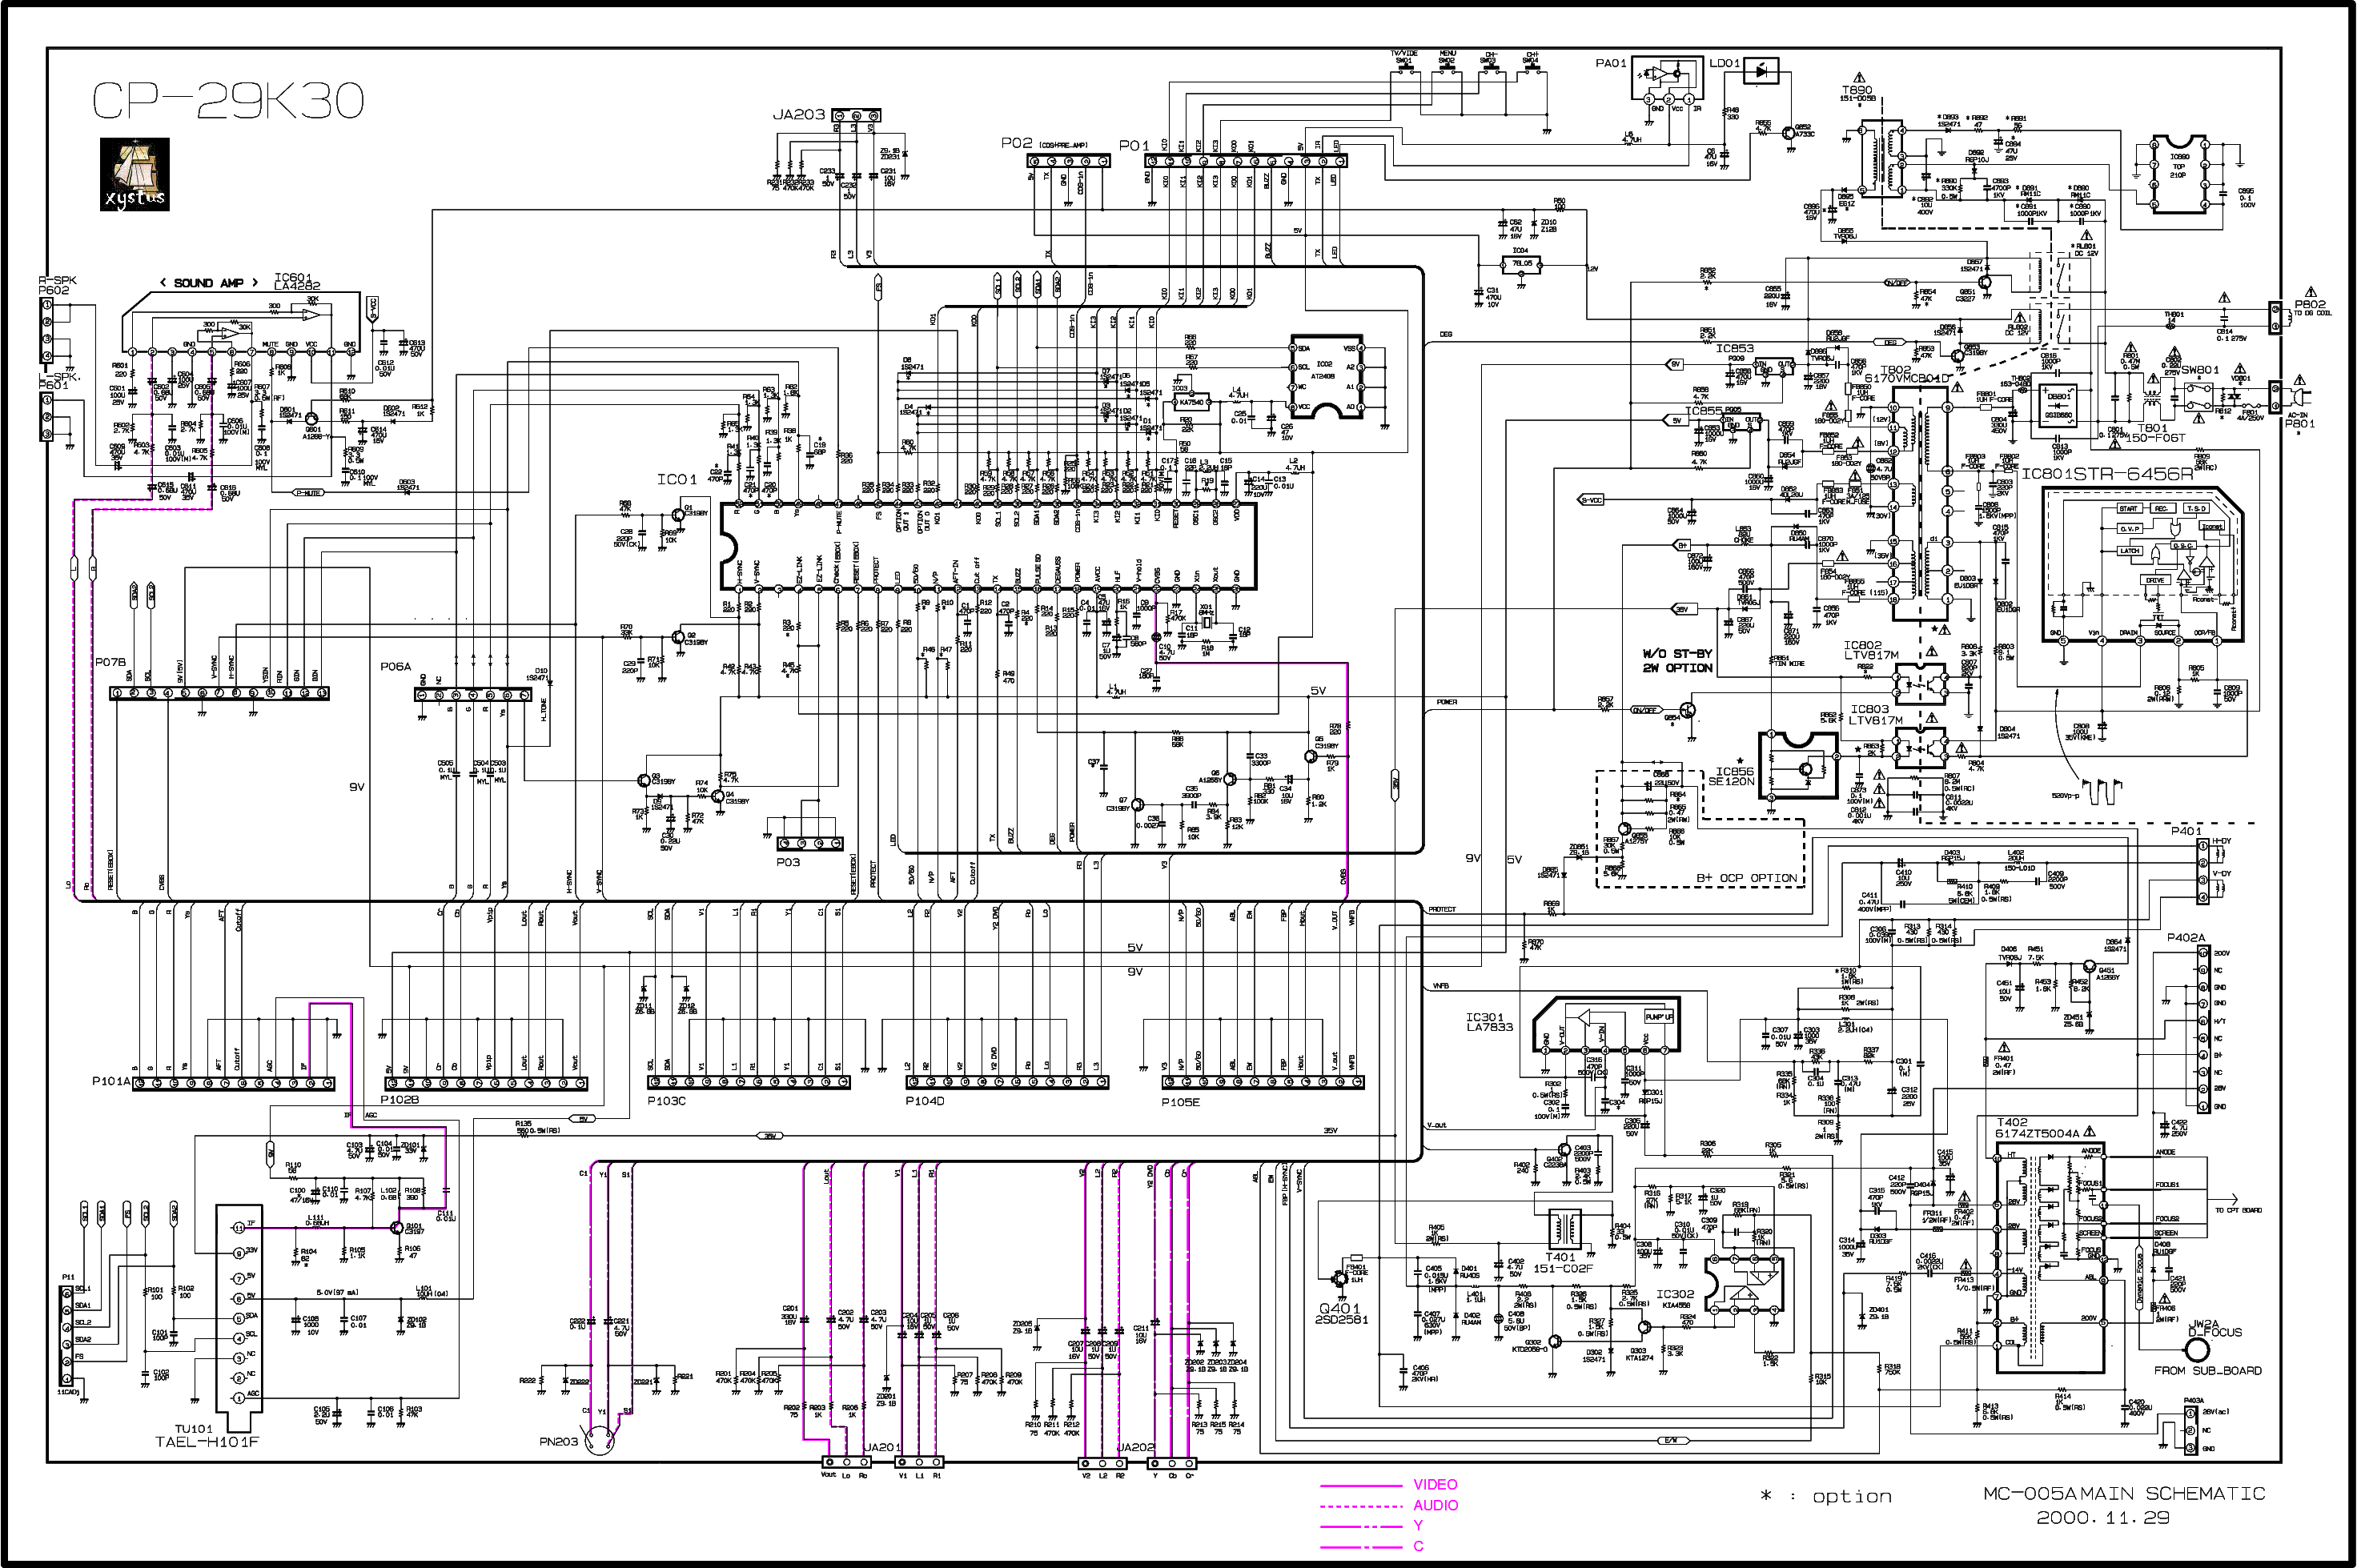 daewoo fel42c1 lcd power supply service manual free download  schematics  eeprom  repair info